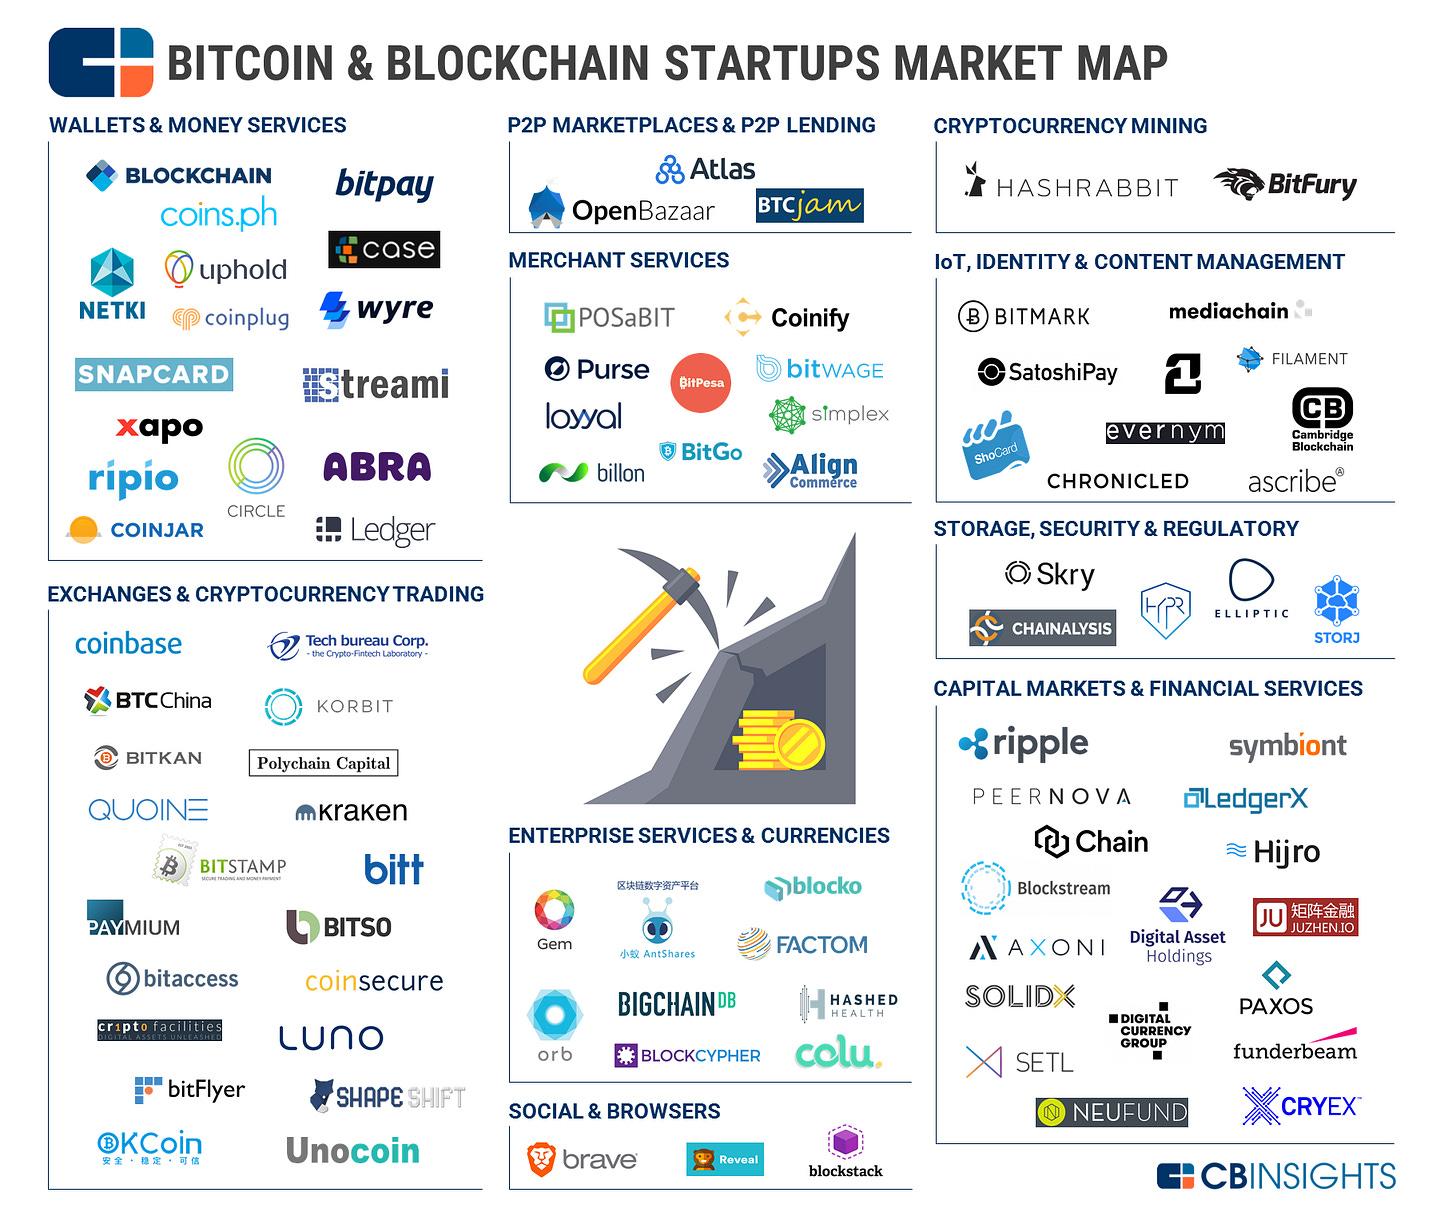 2017.02.07 Blockchain Market Map v6